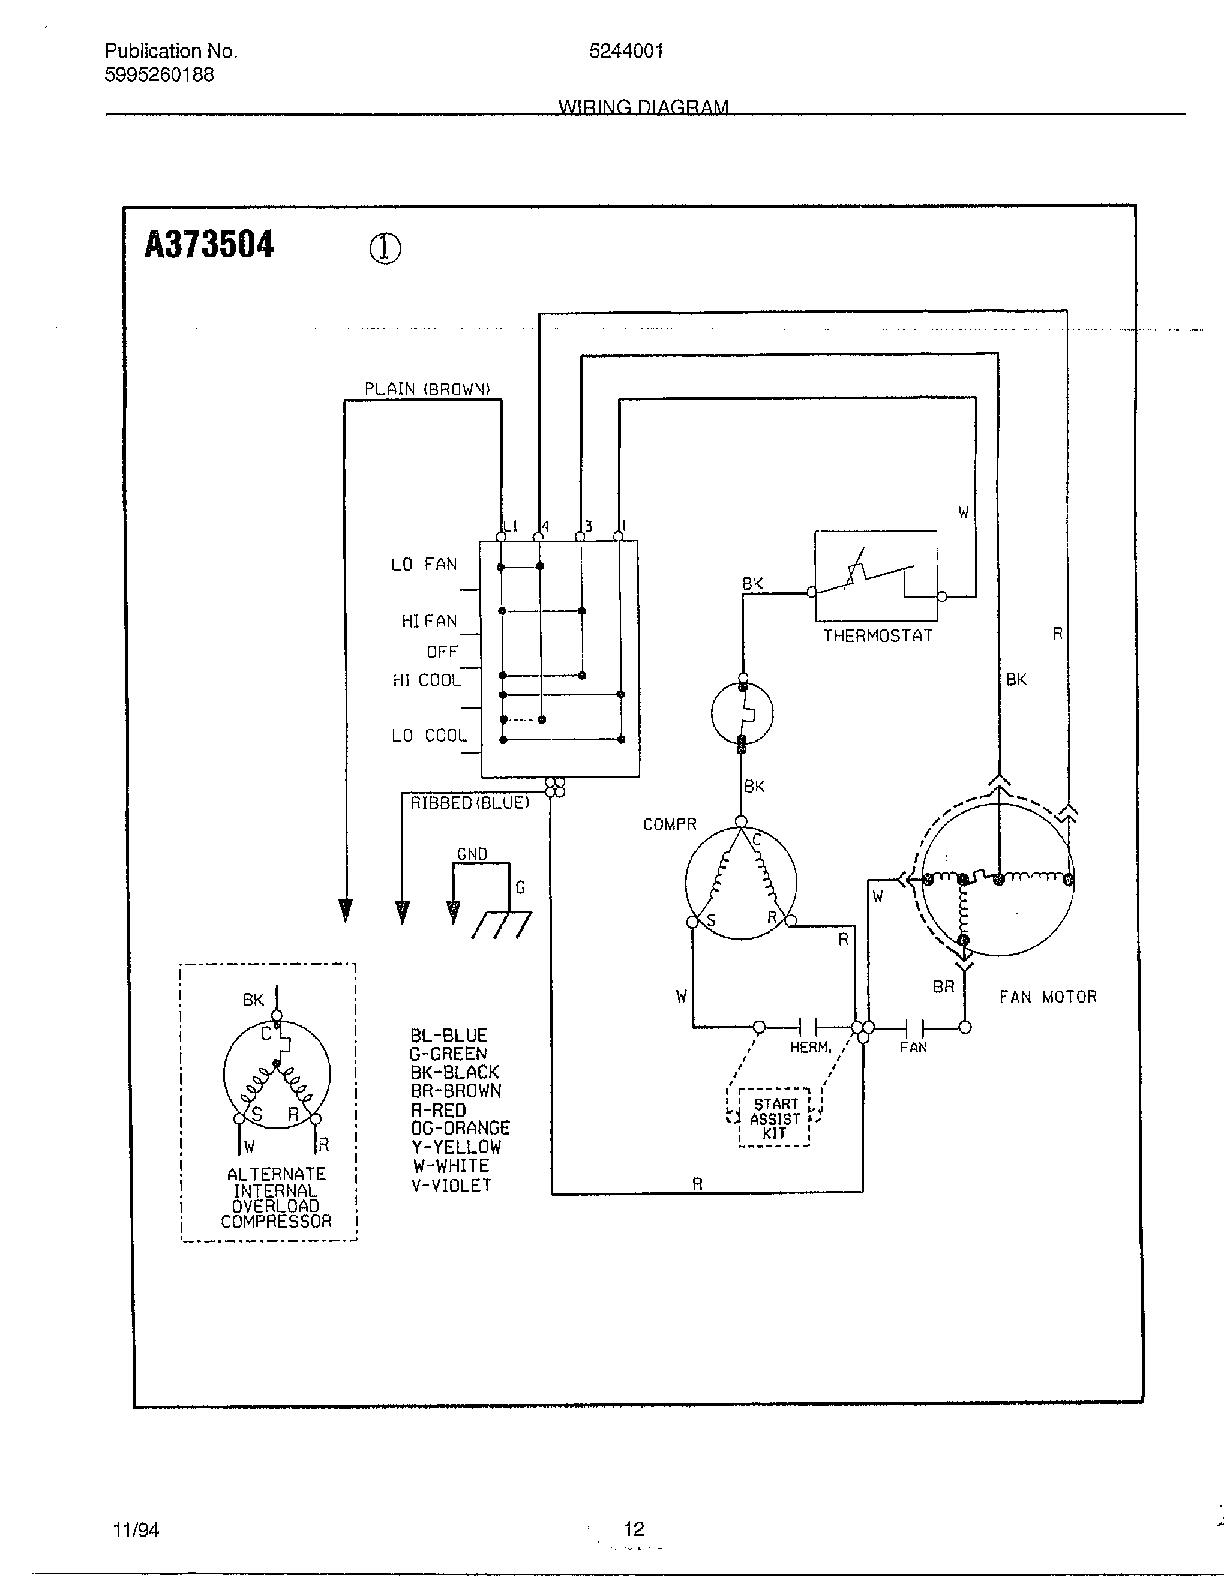 wiring diagram for hvac unit 3 phase electric motor starter window refrigerator